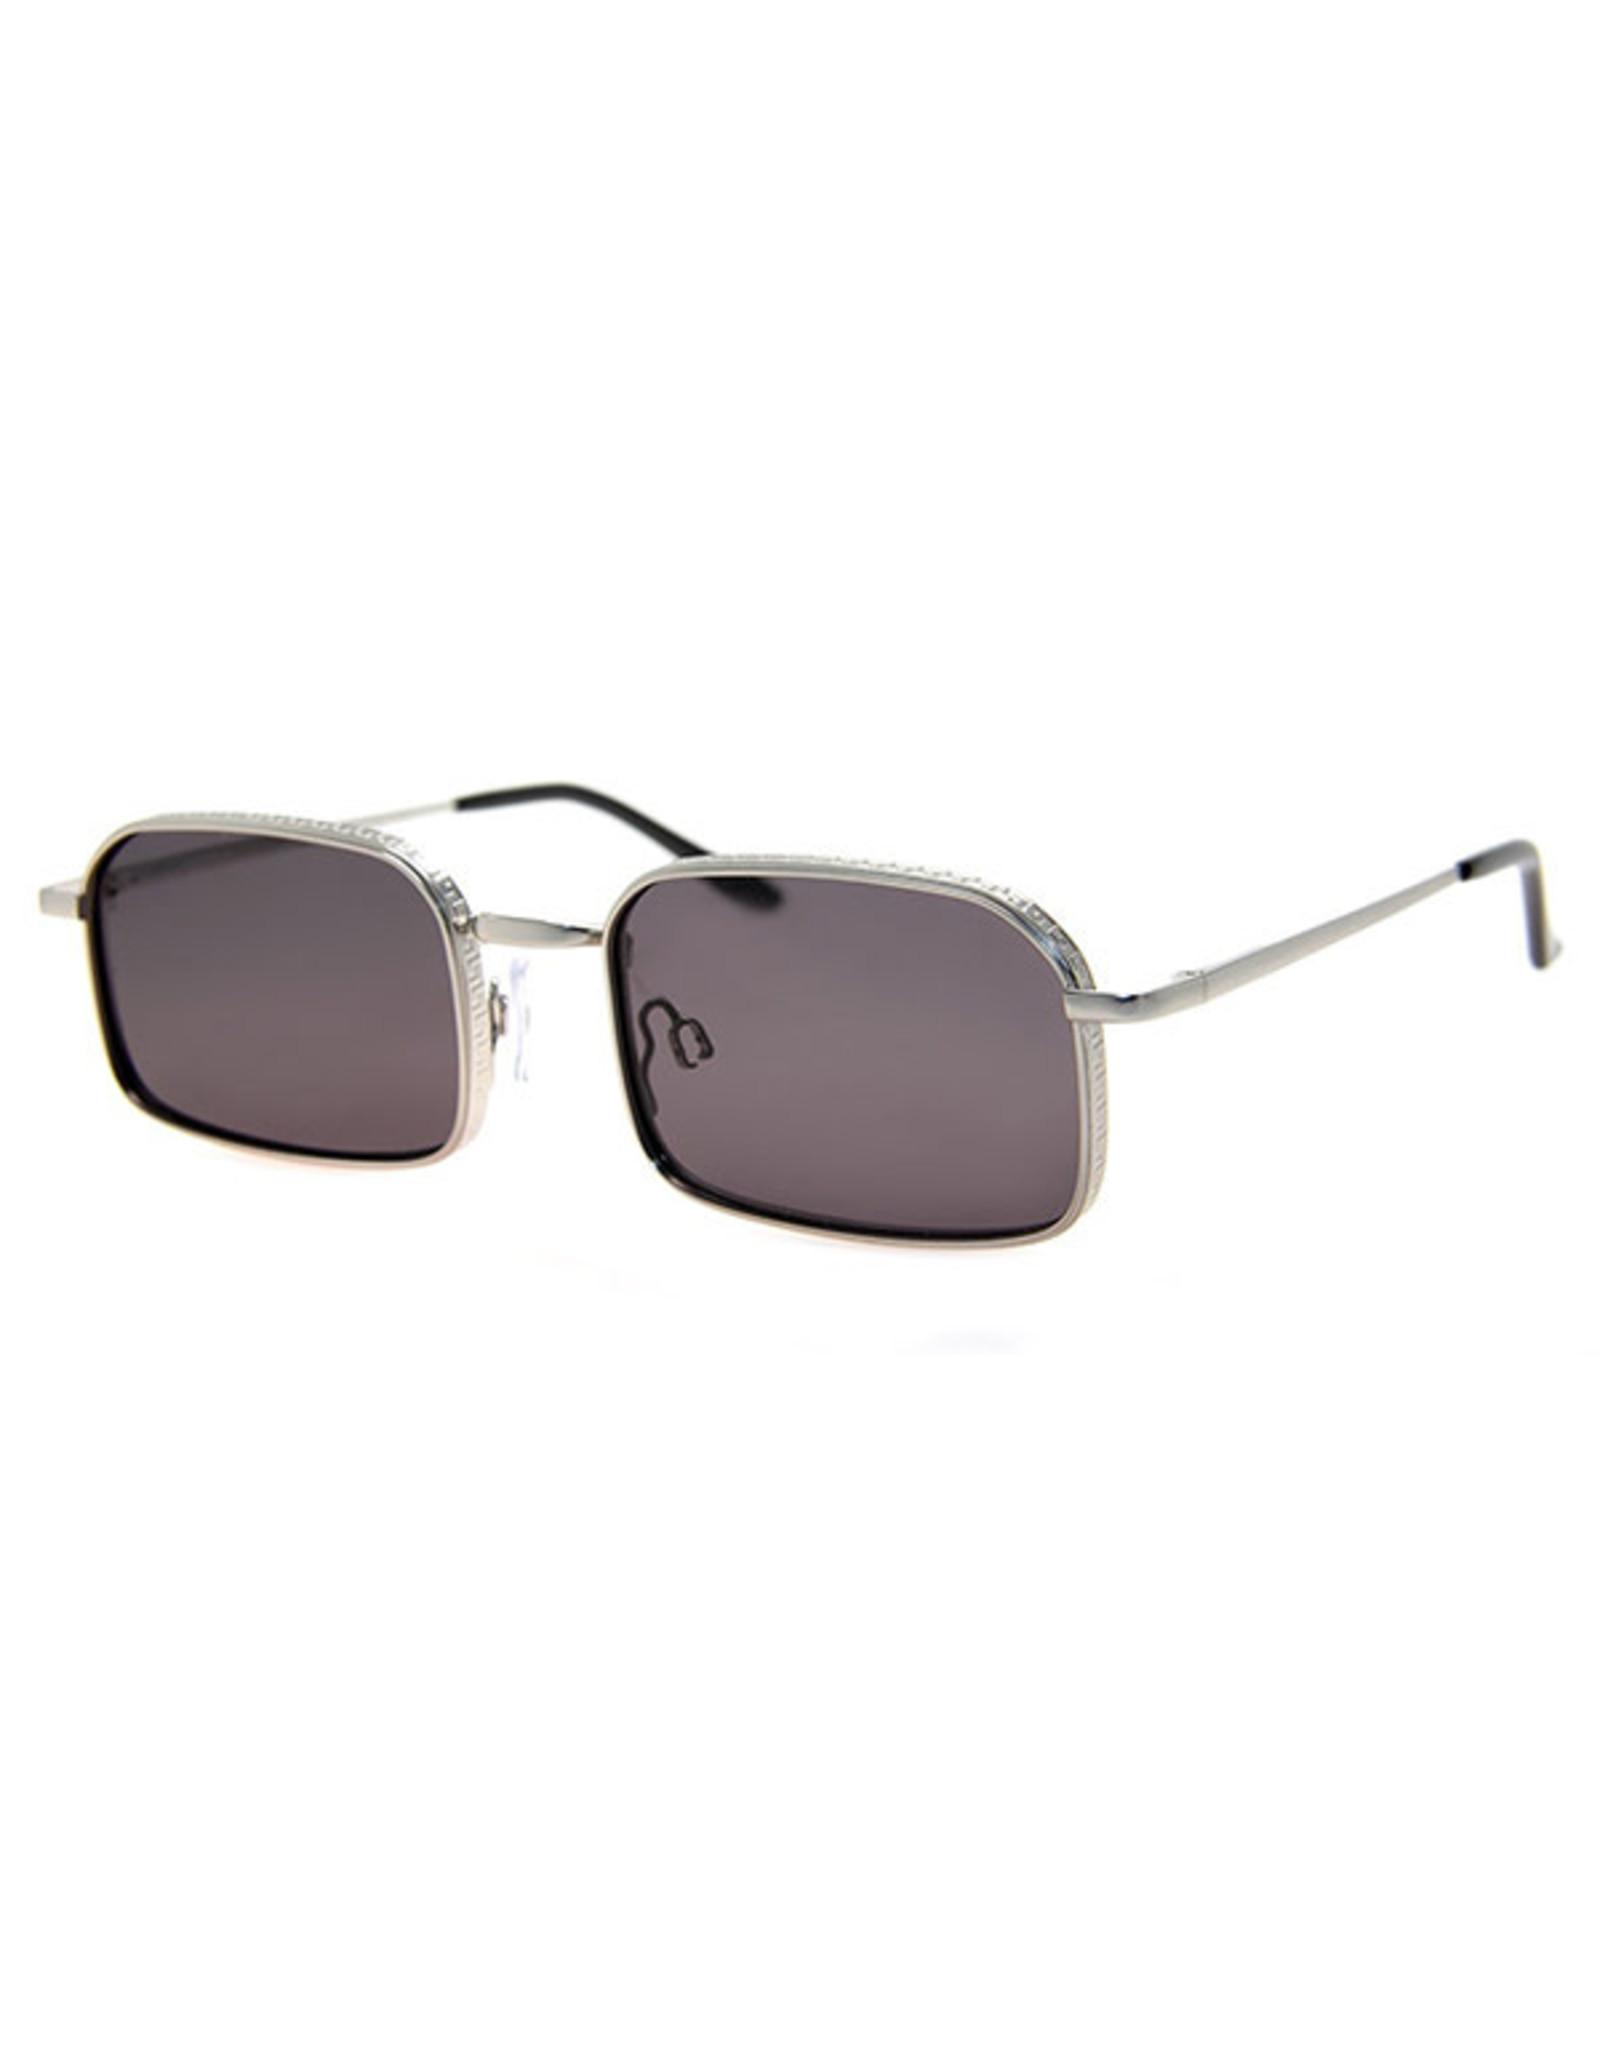 AJM - Rectangle Wire Frame Sunglasses